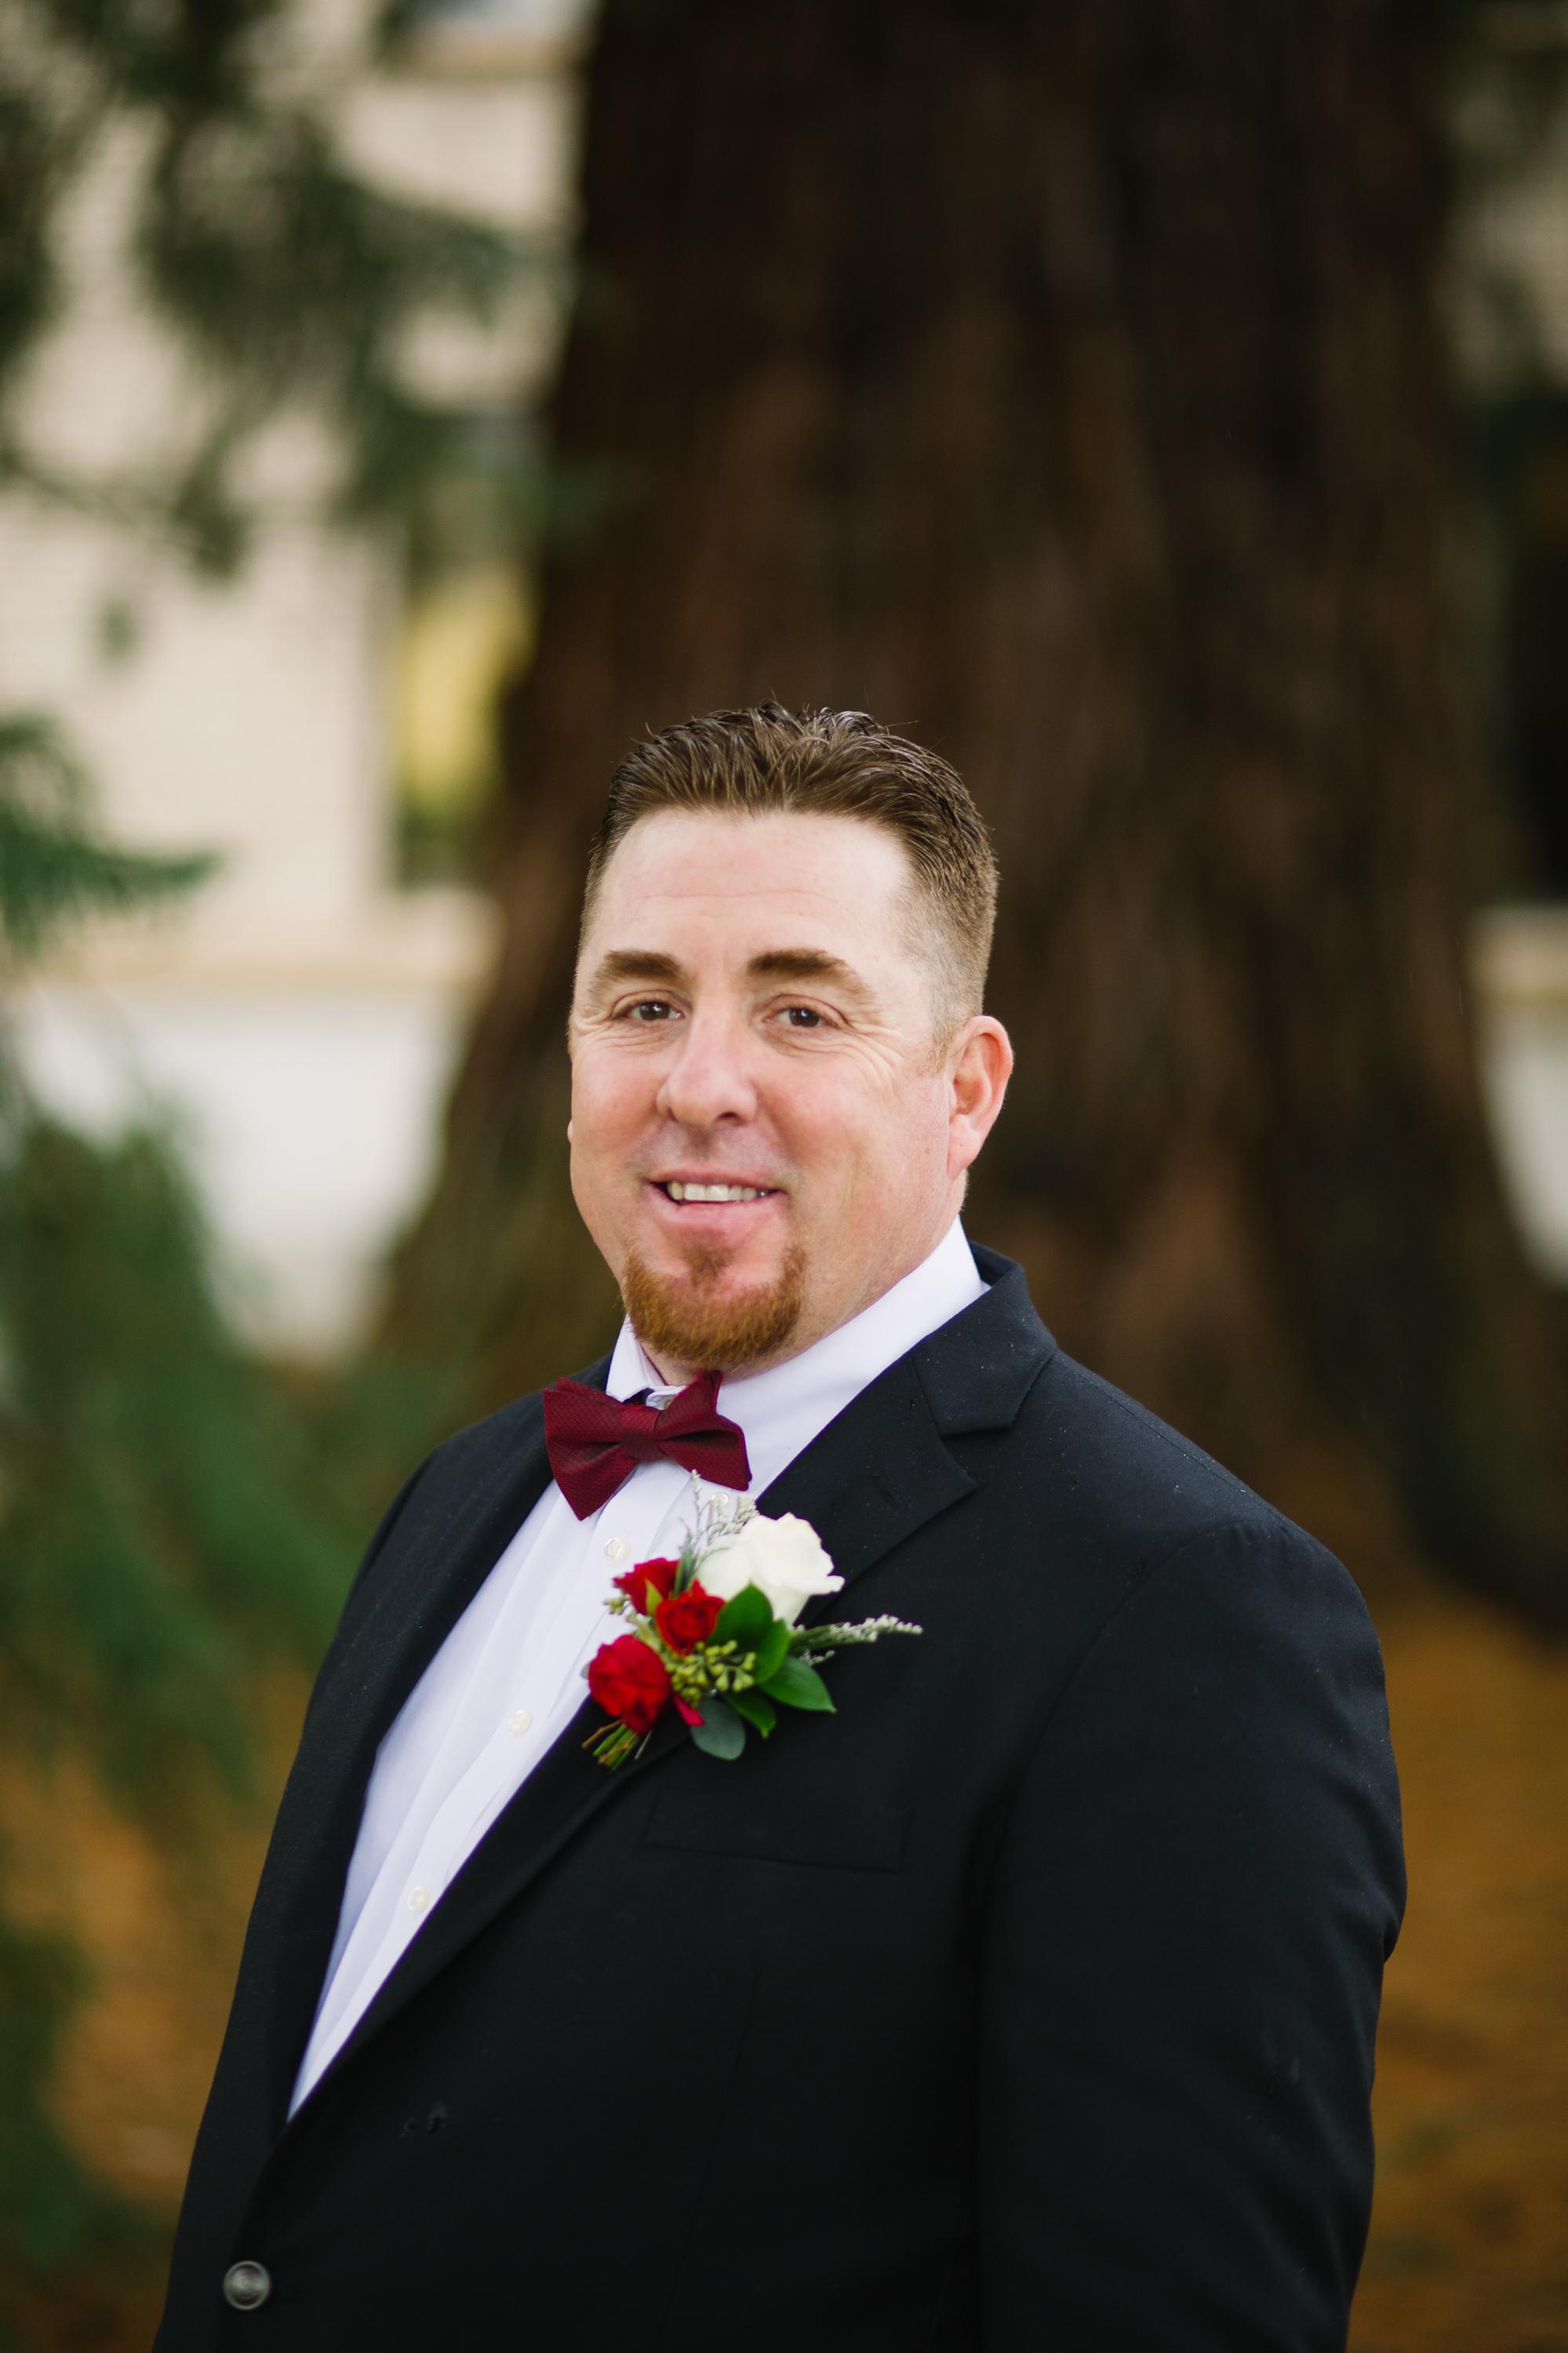 hillsboro-wedding-photography-24.jpg